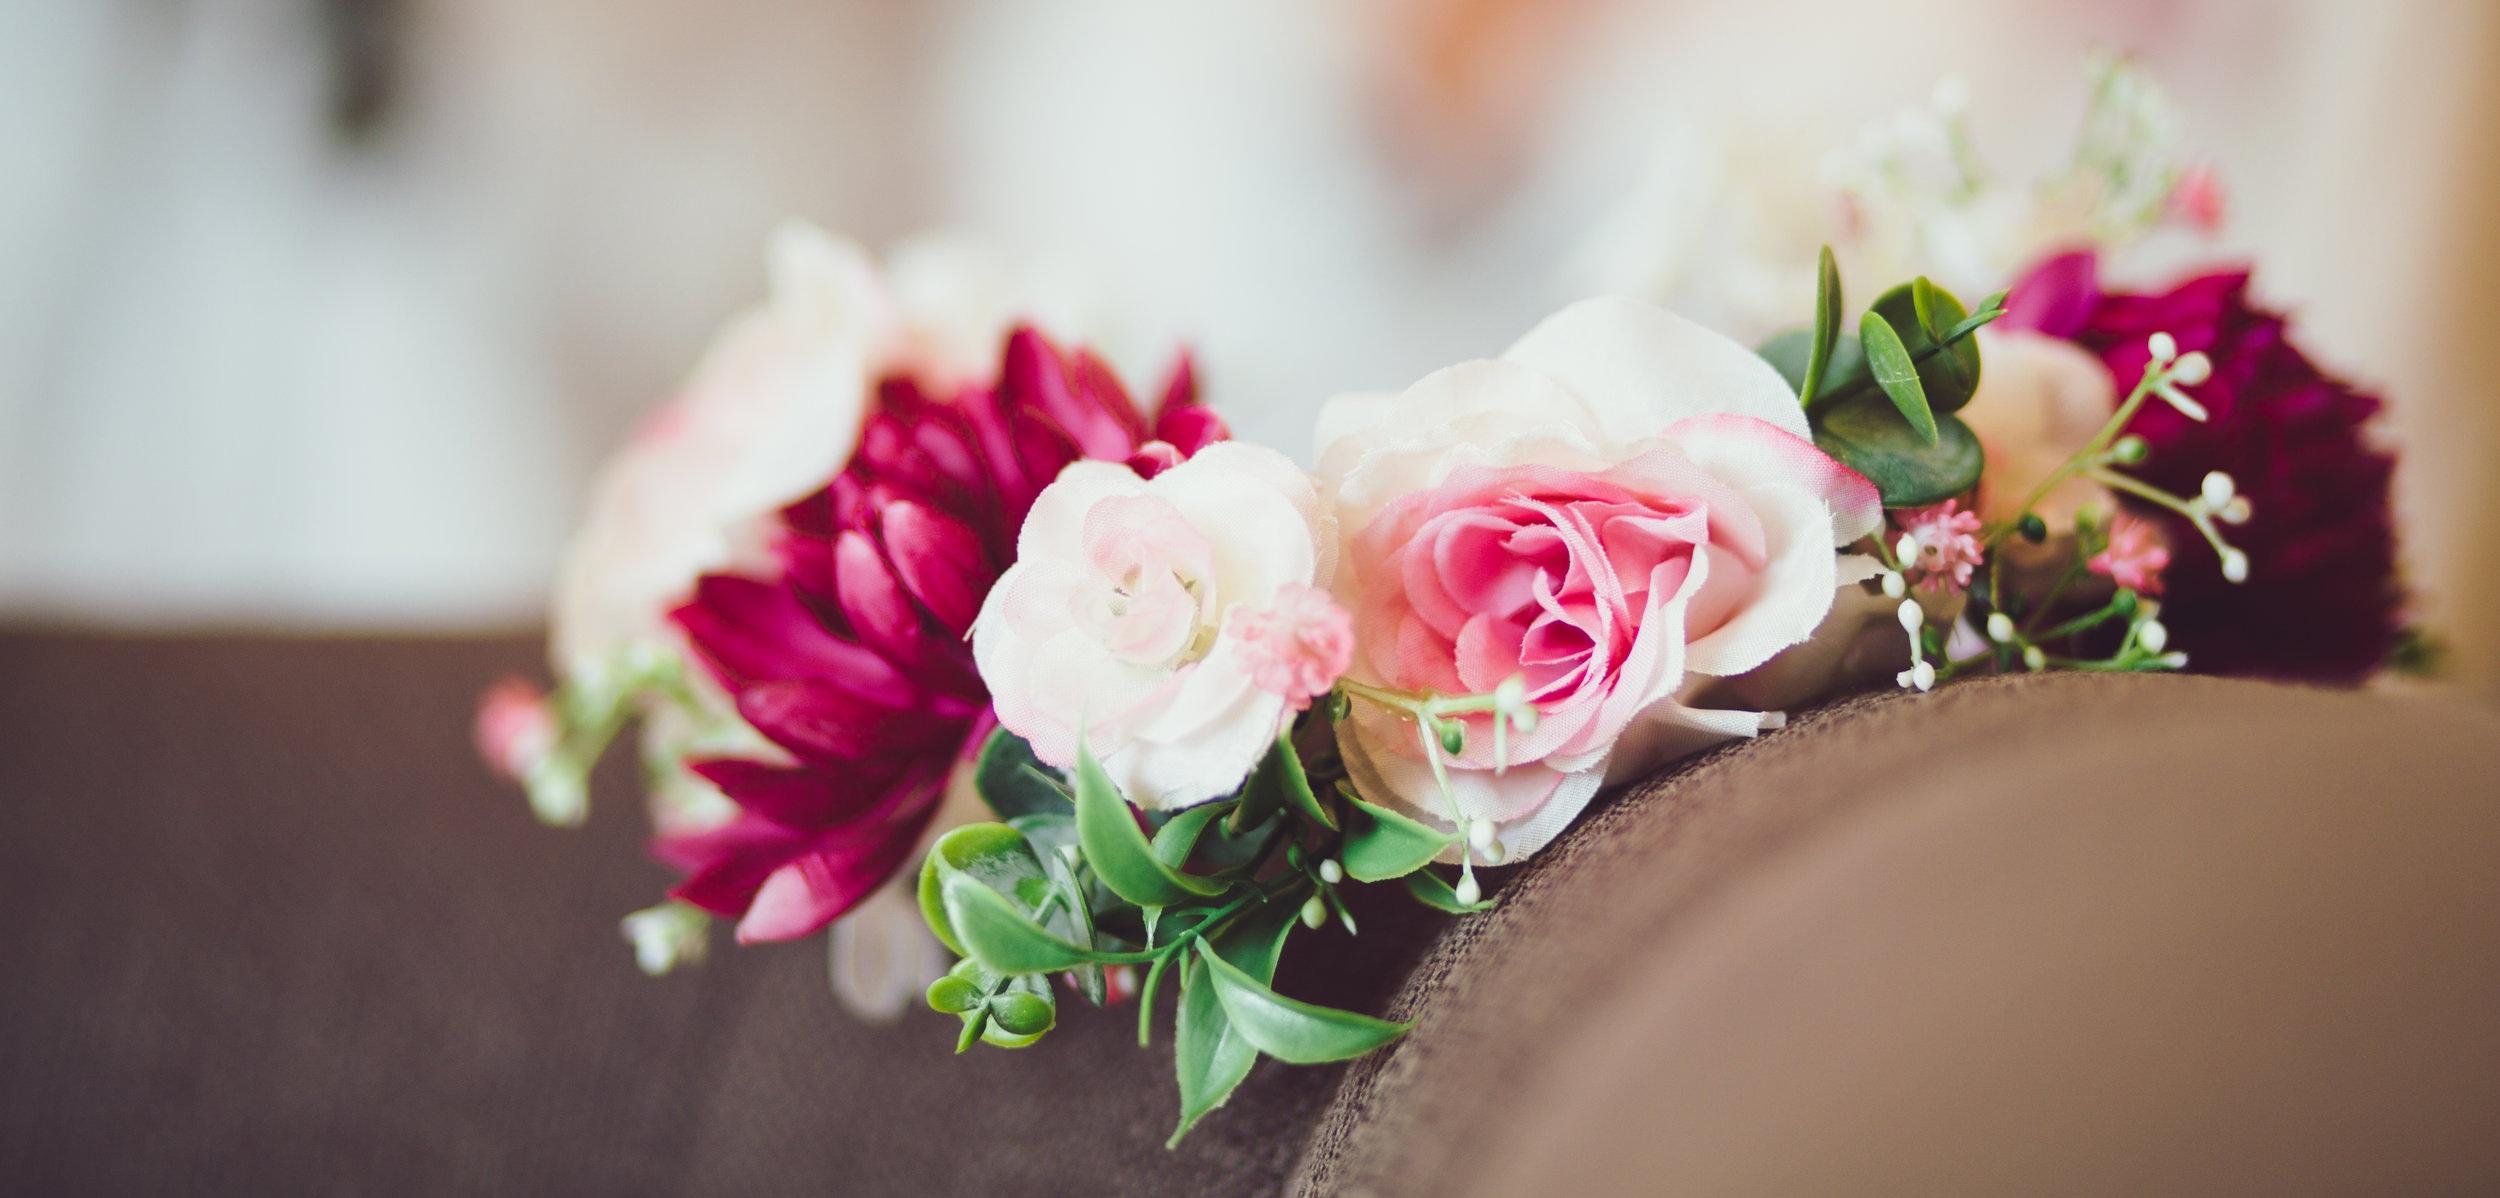 Binder_Wedding_BLOG-42.jpg